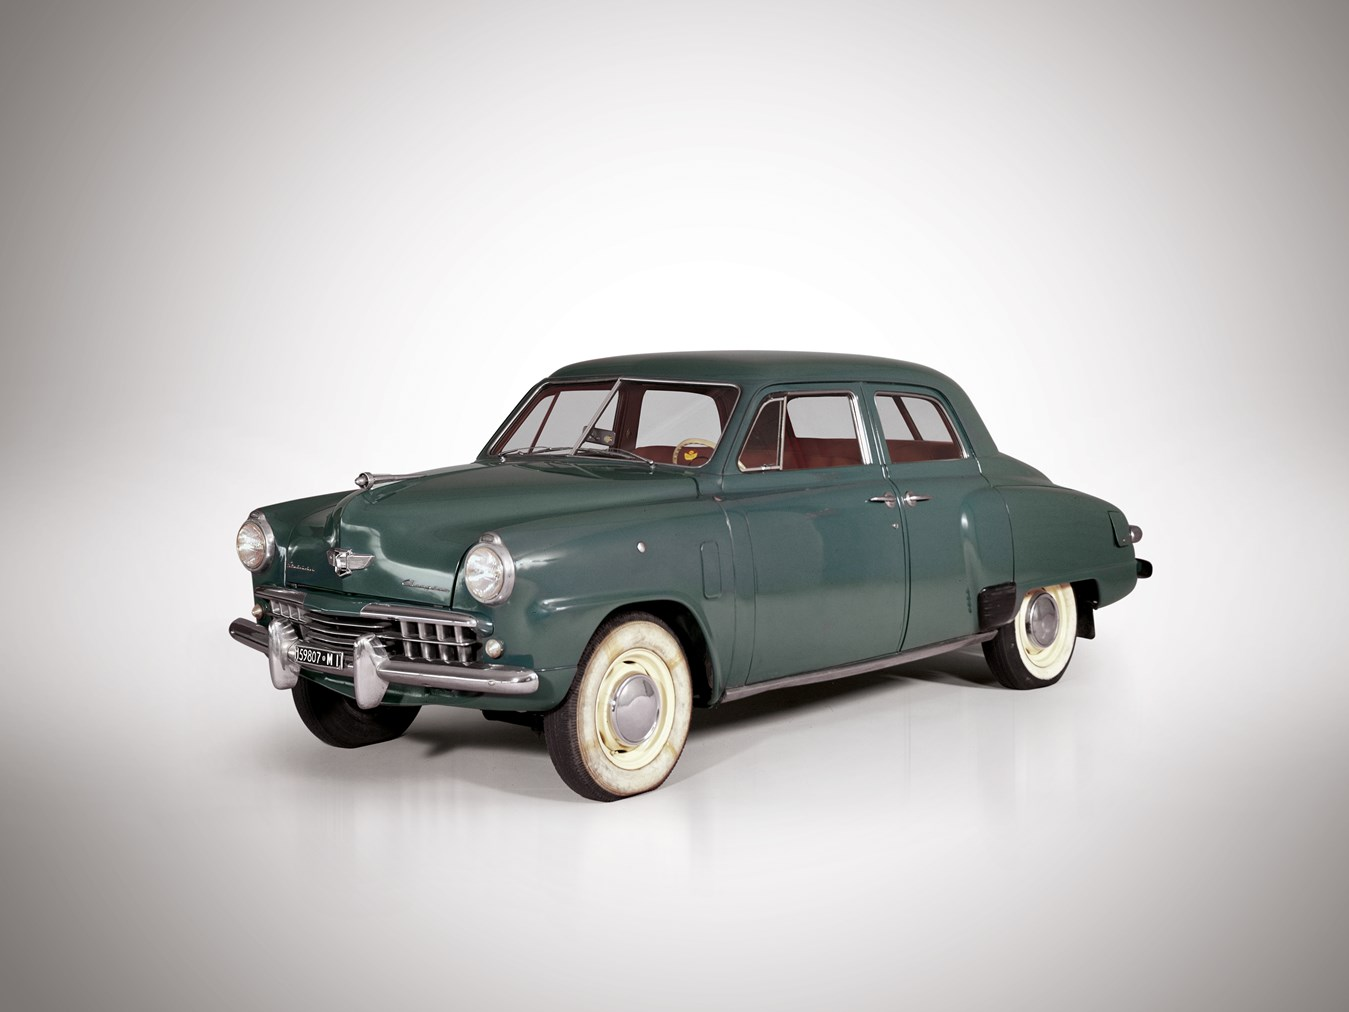 1948 Studebaker Champion DeLuxe Sedan